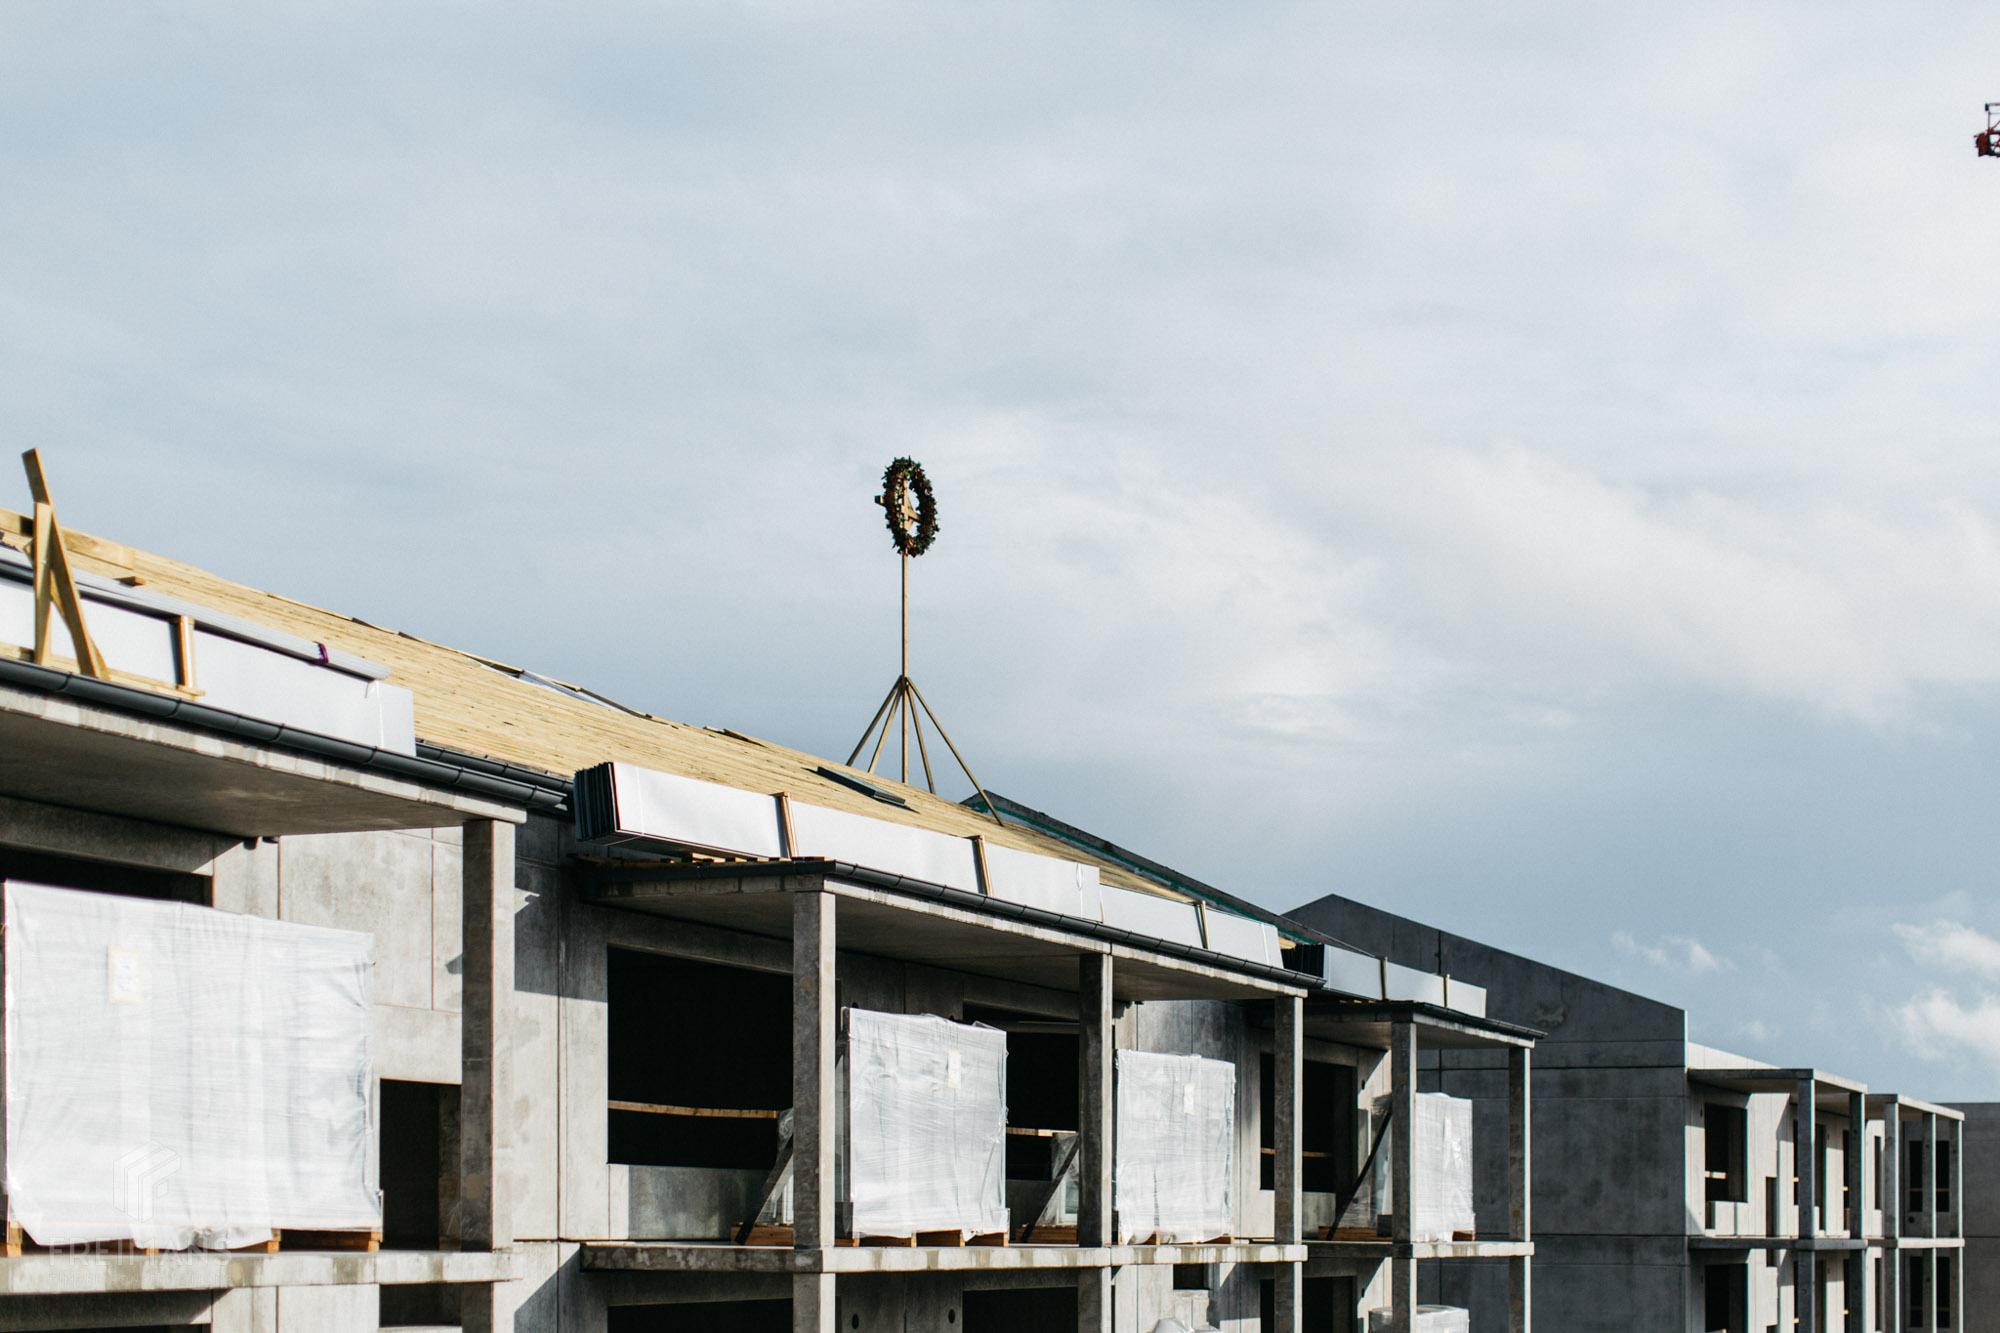 koka kopnes jumta konstrukcija 14